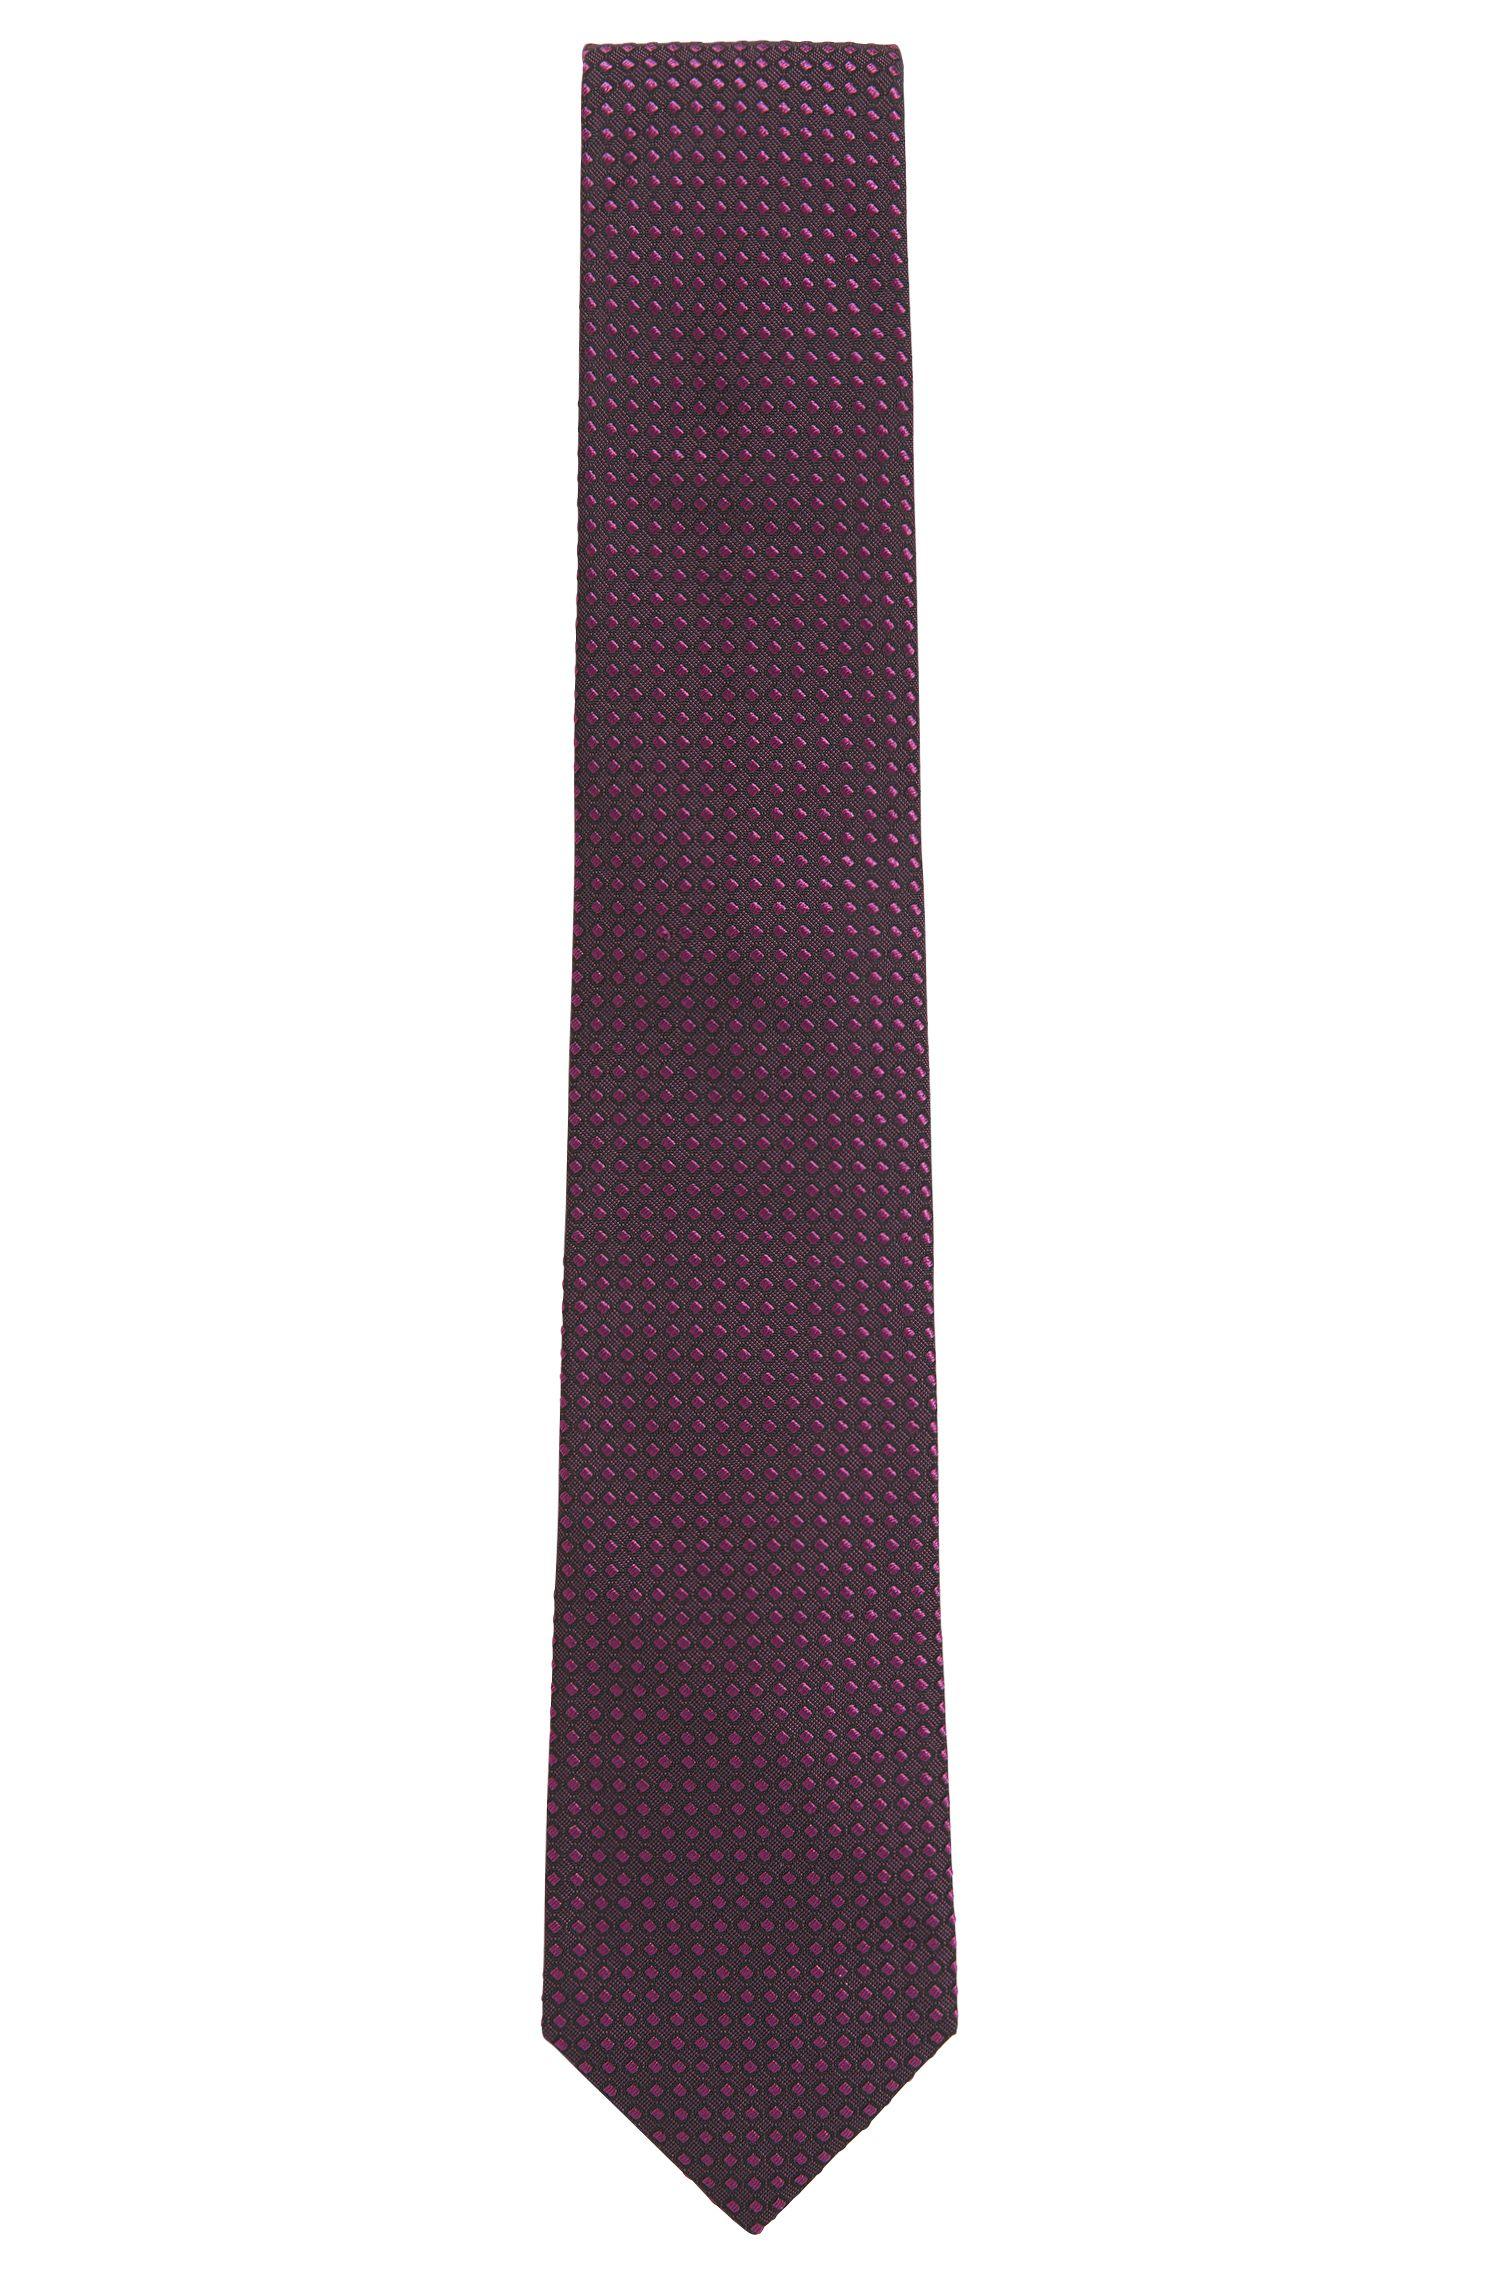 Ton in Ton gemusterte Krawatte aus Seiden-Jacquard